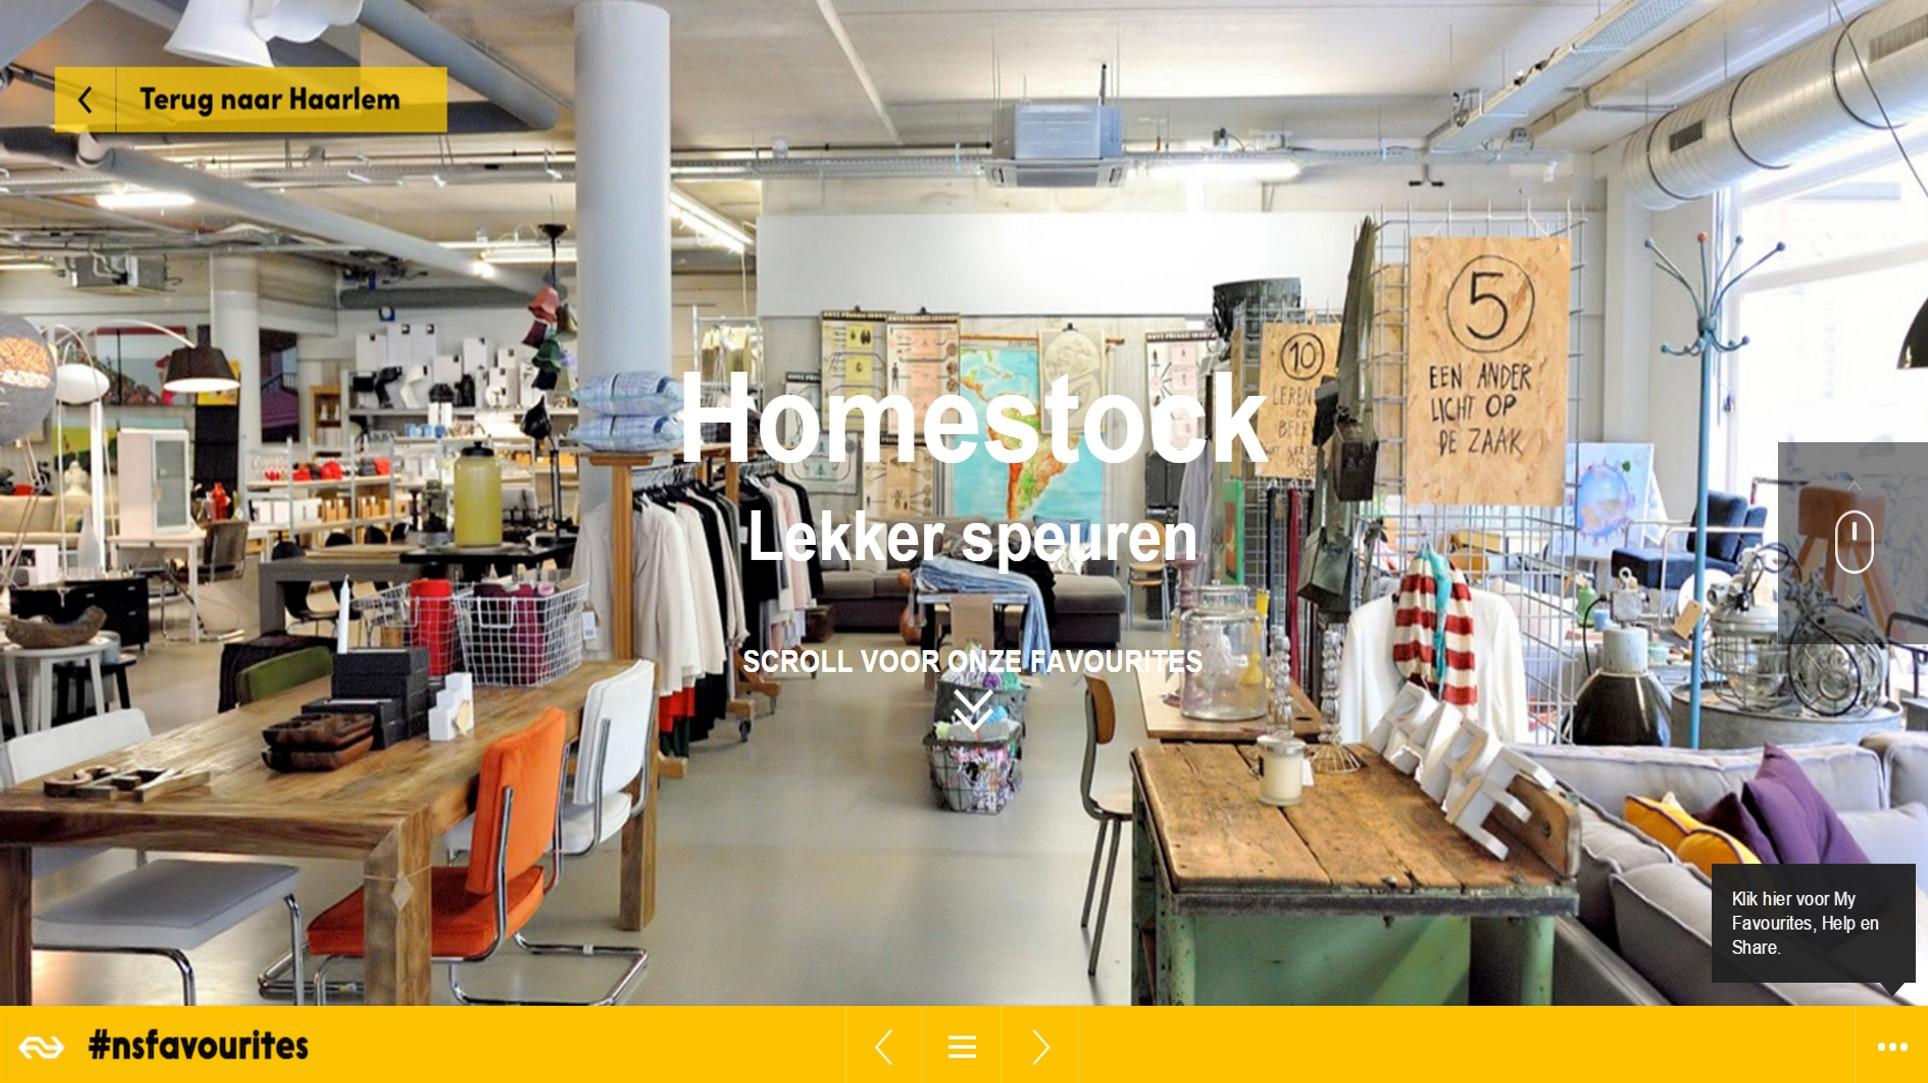 NS Favourites Homestock 3